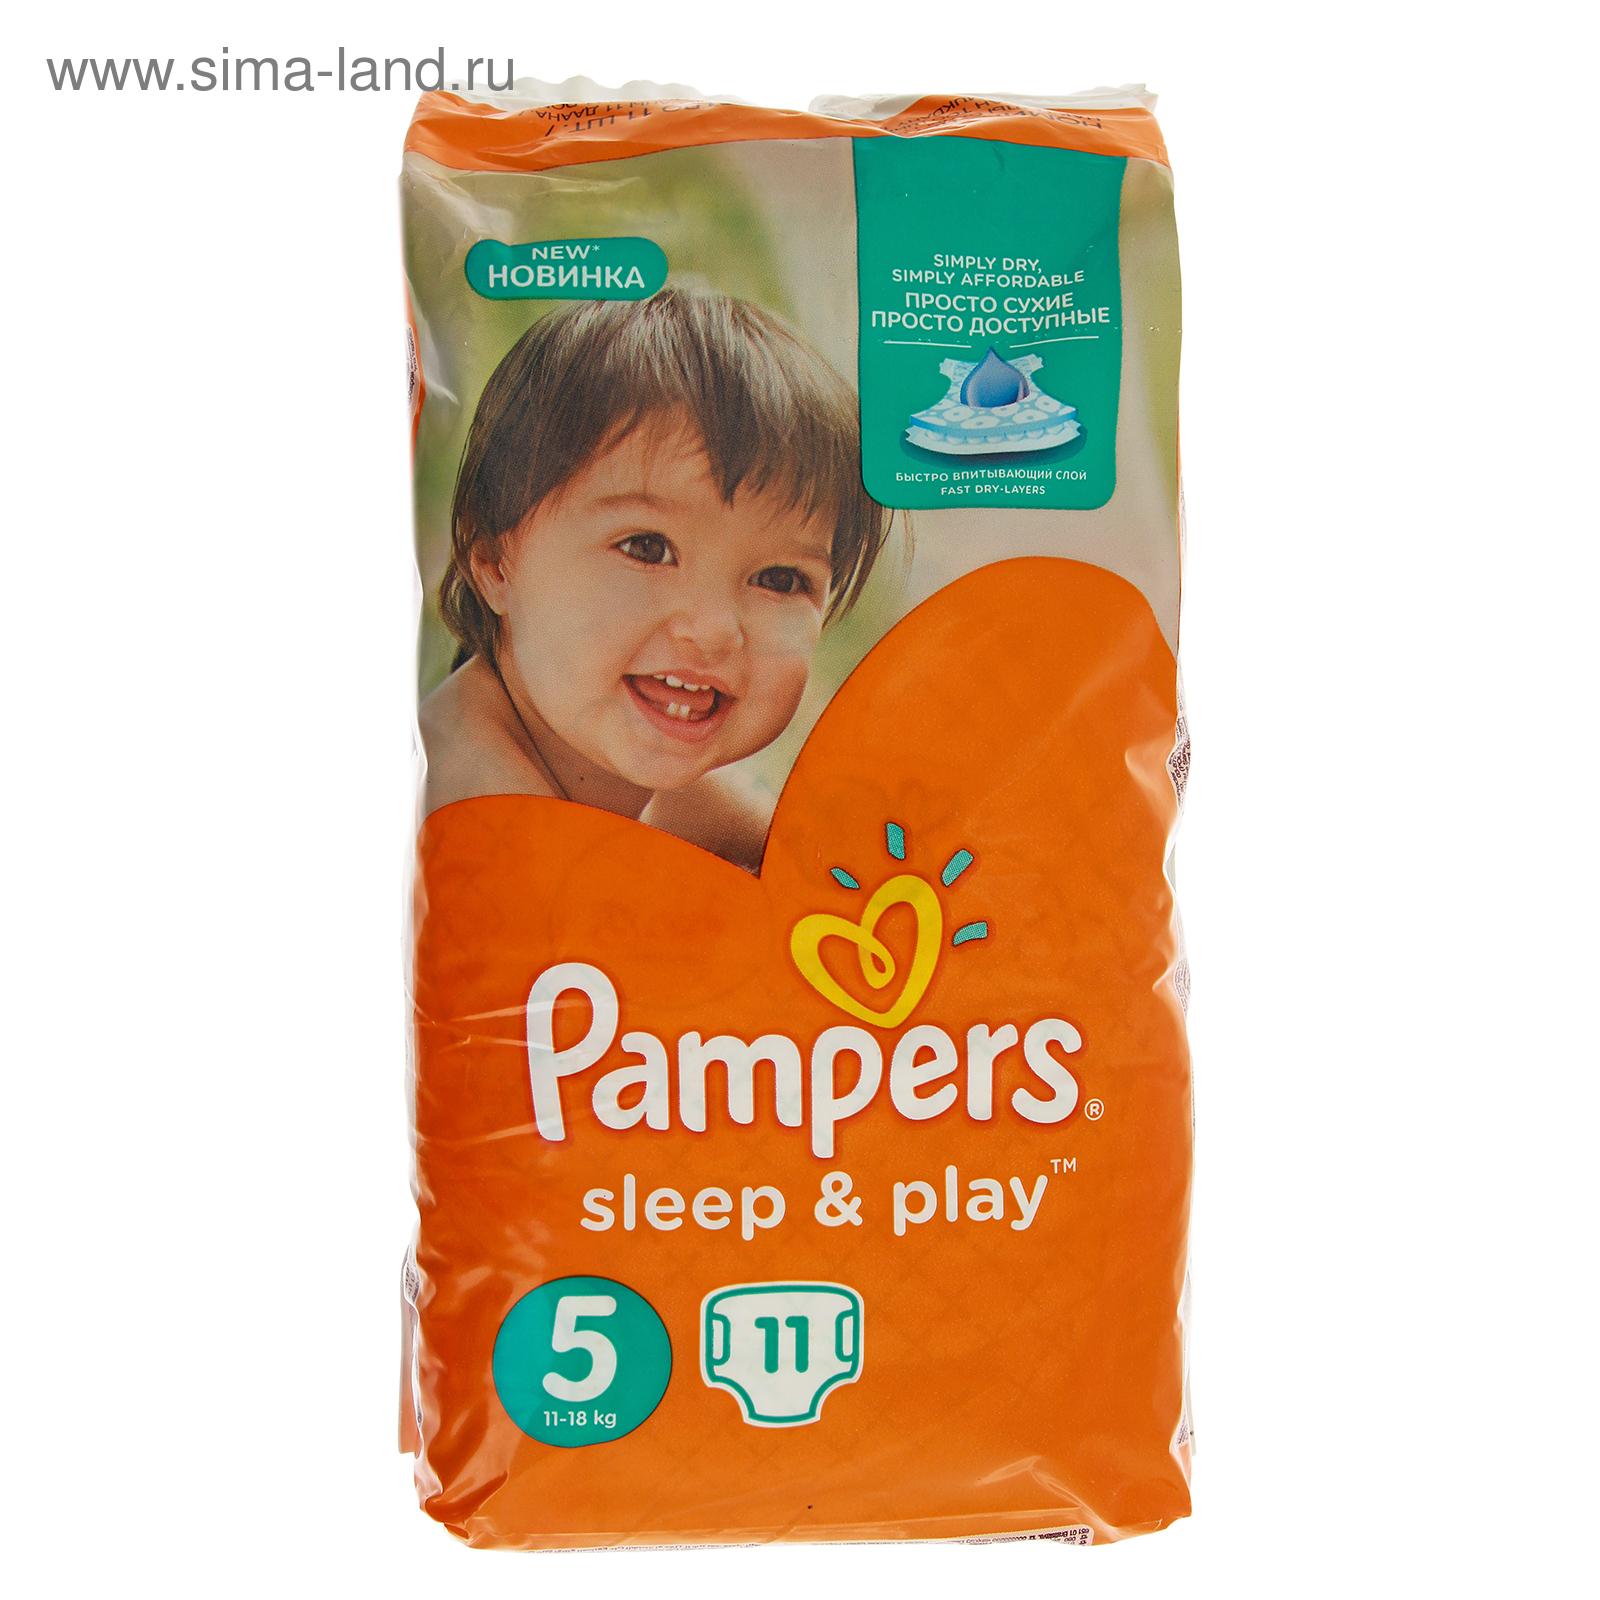 eb47aeacd6fe Подгузники «Pampers» Sleep Play, Junior, 11-18 кг, 11 шт уп (1389895 ...